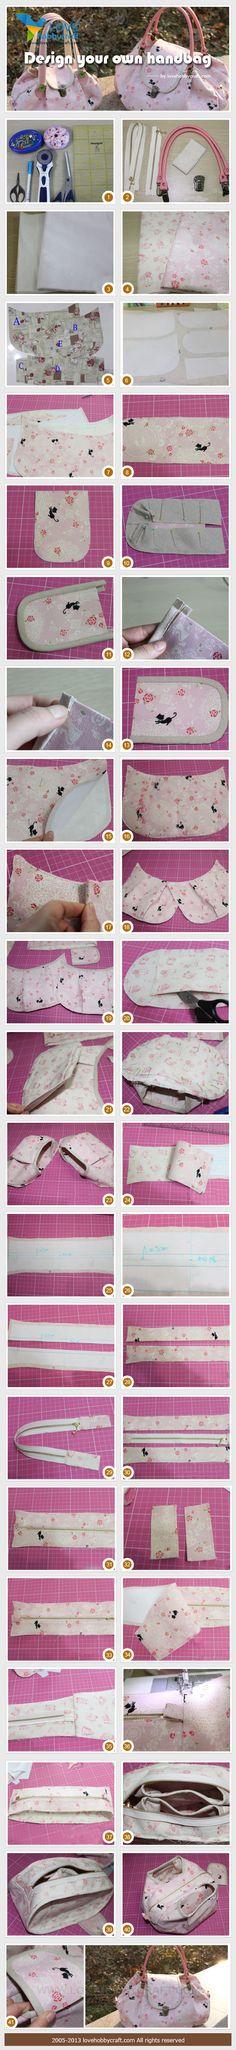 design-your-own-handbag